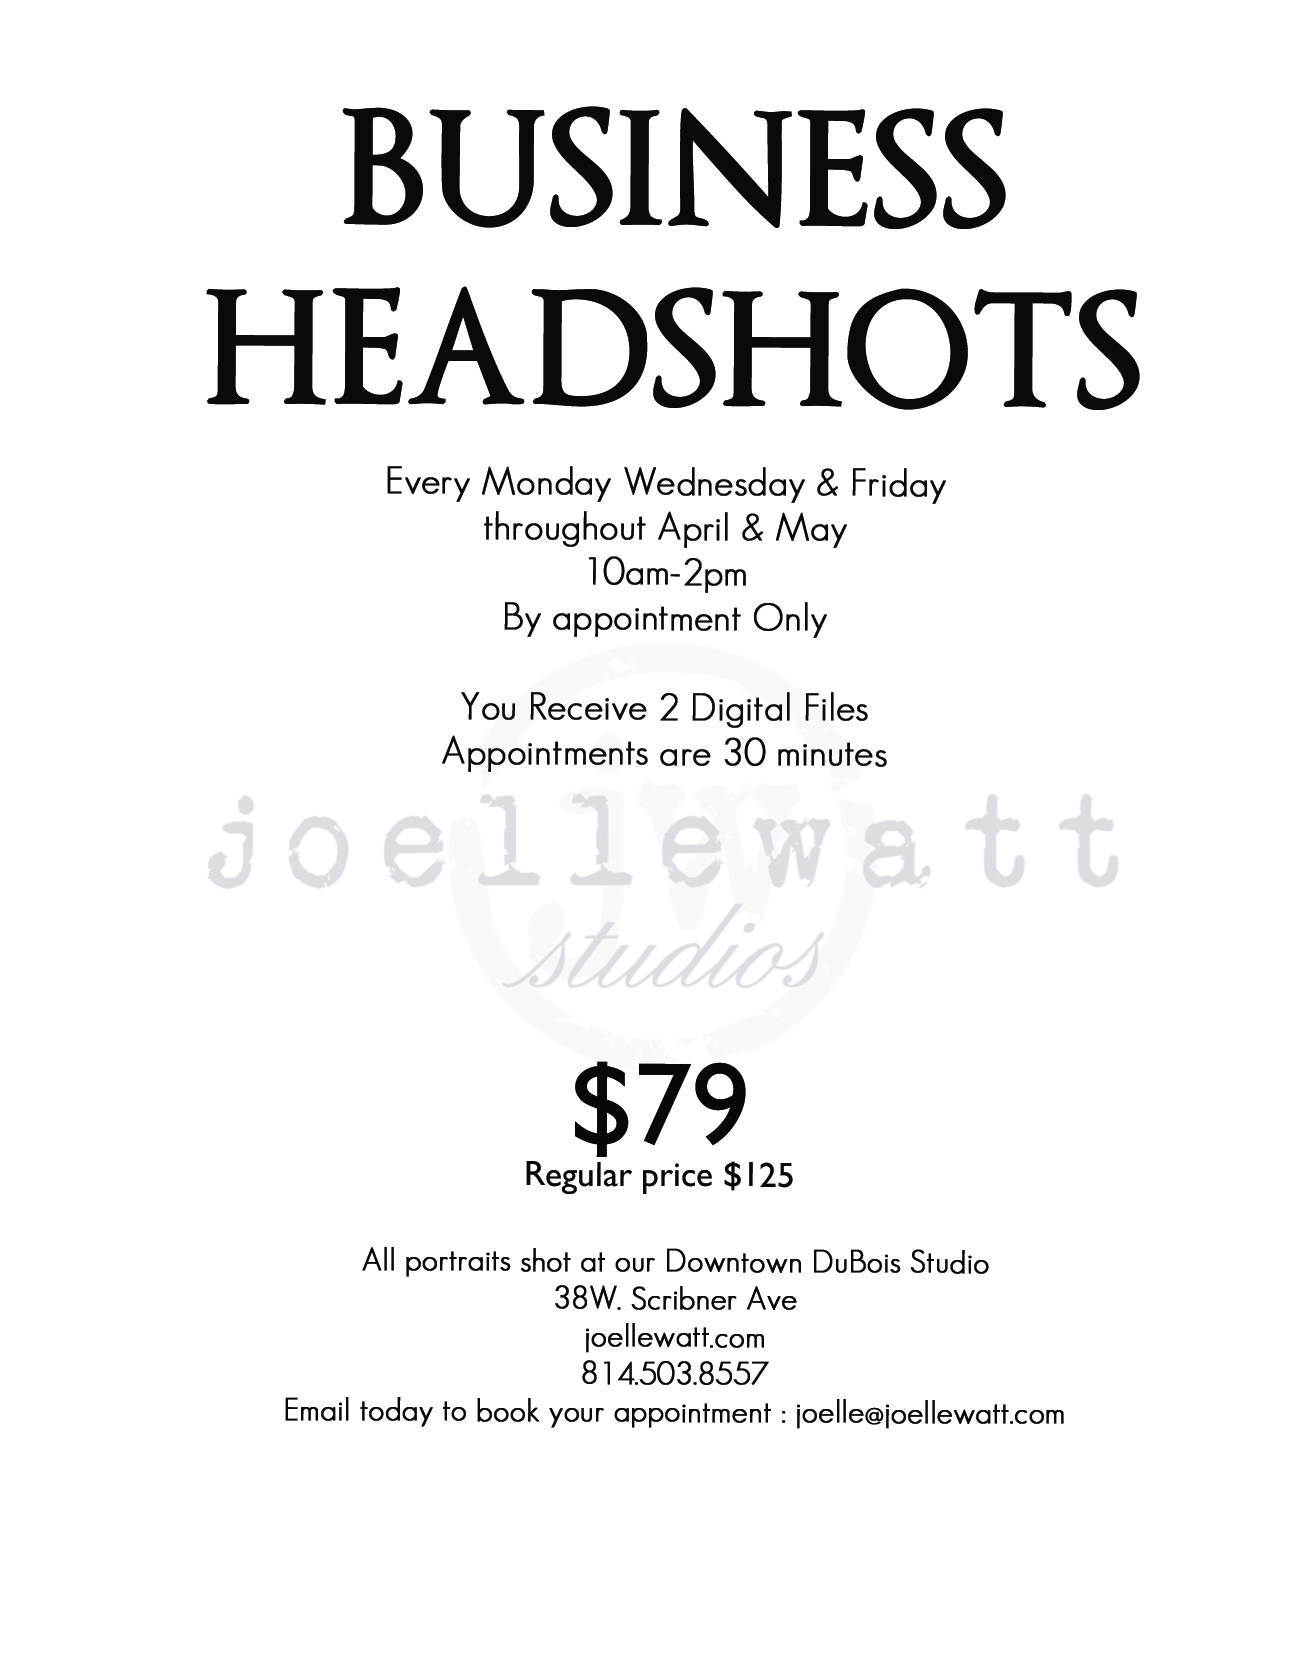 Business Headshots blogad.jpg